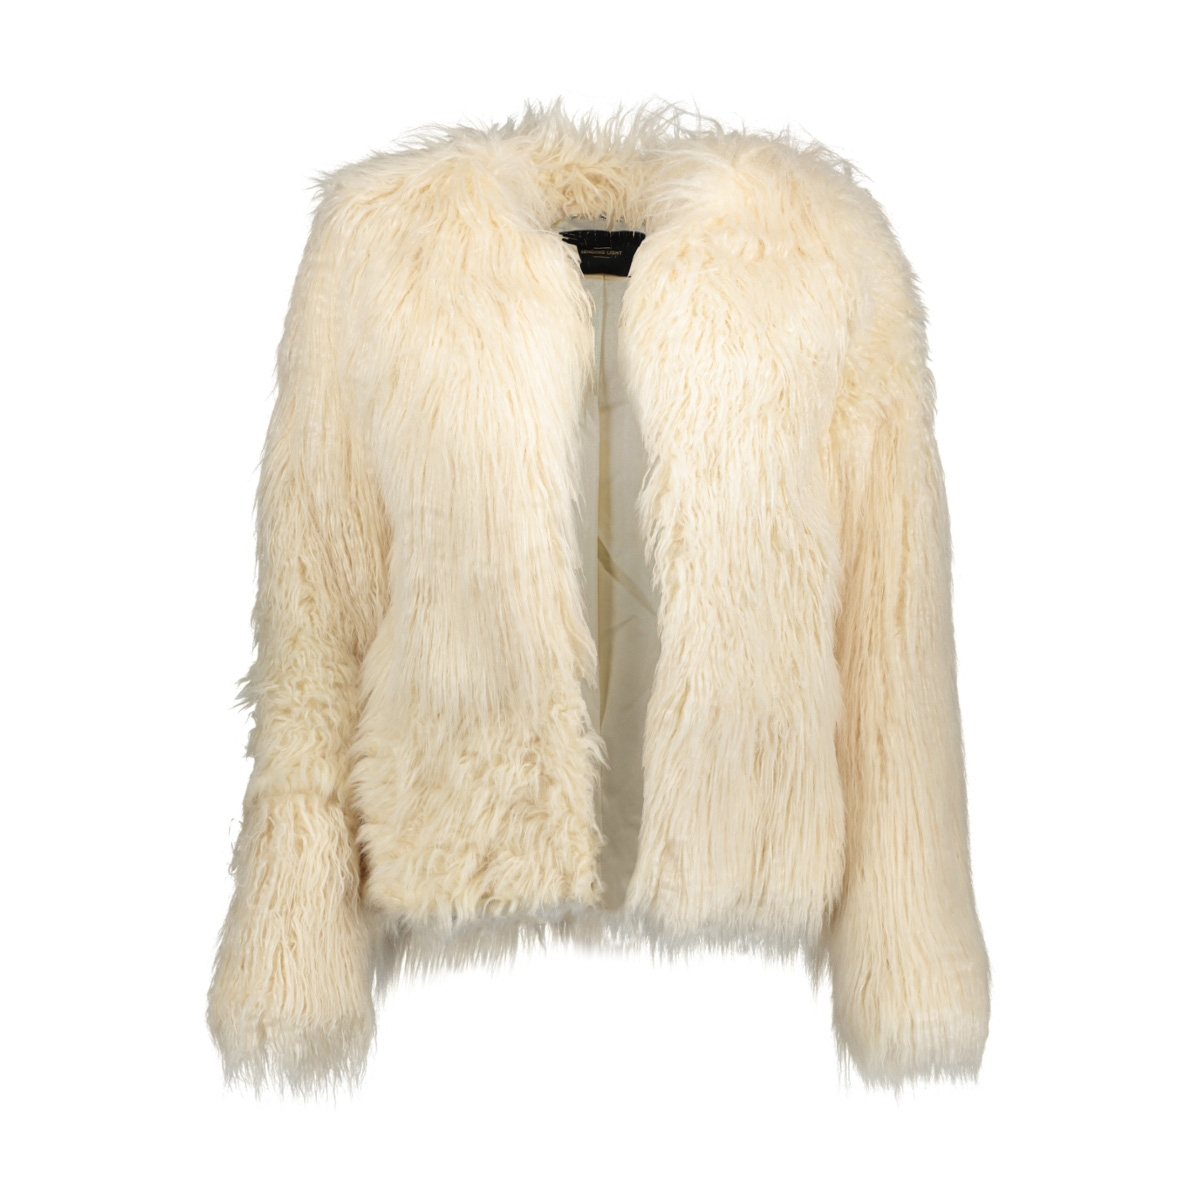 20-580-7103 10 days jas white wool